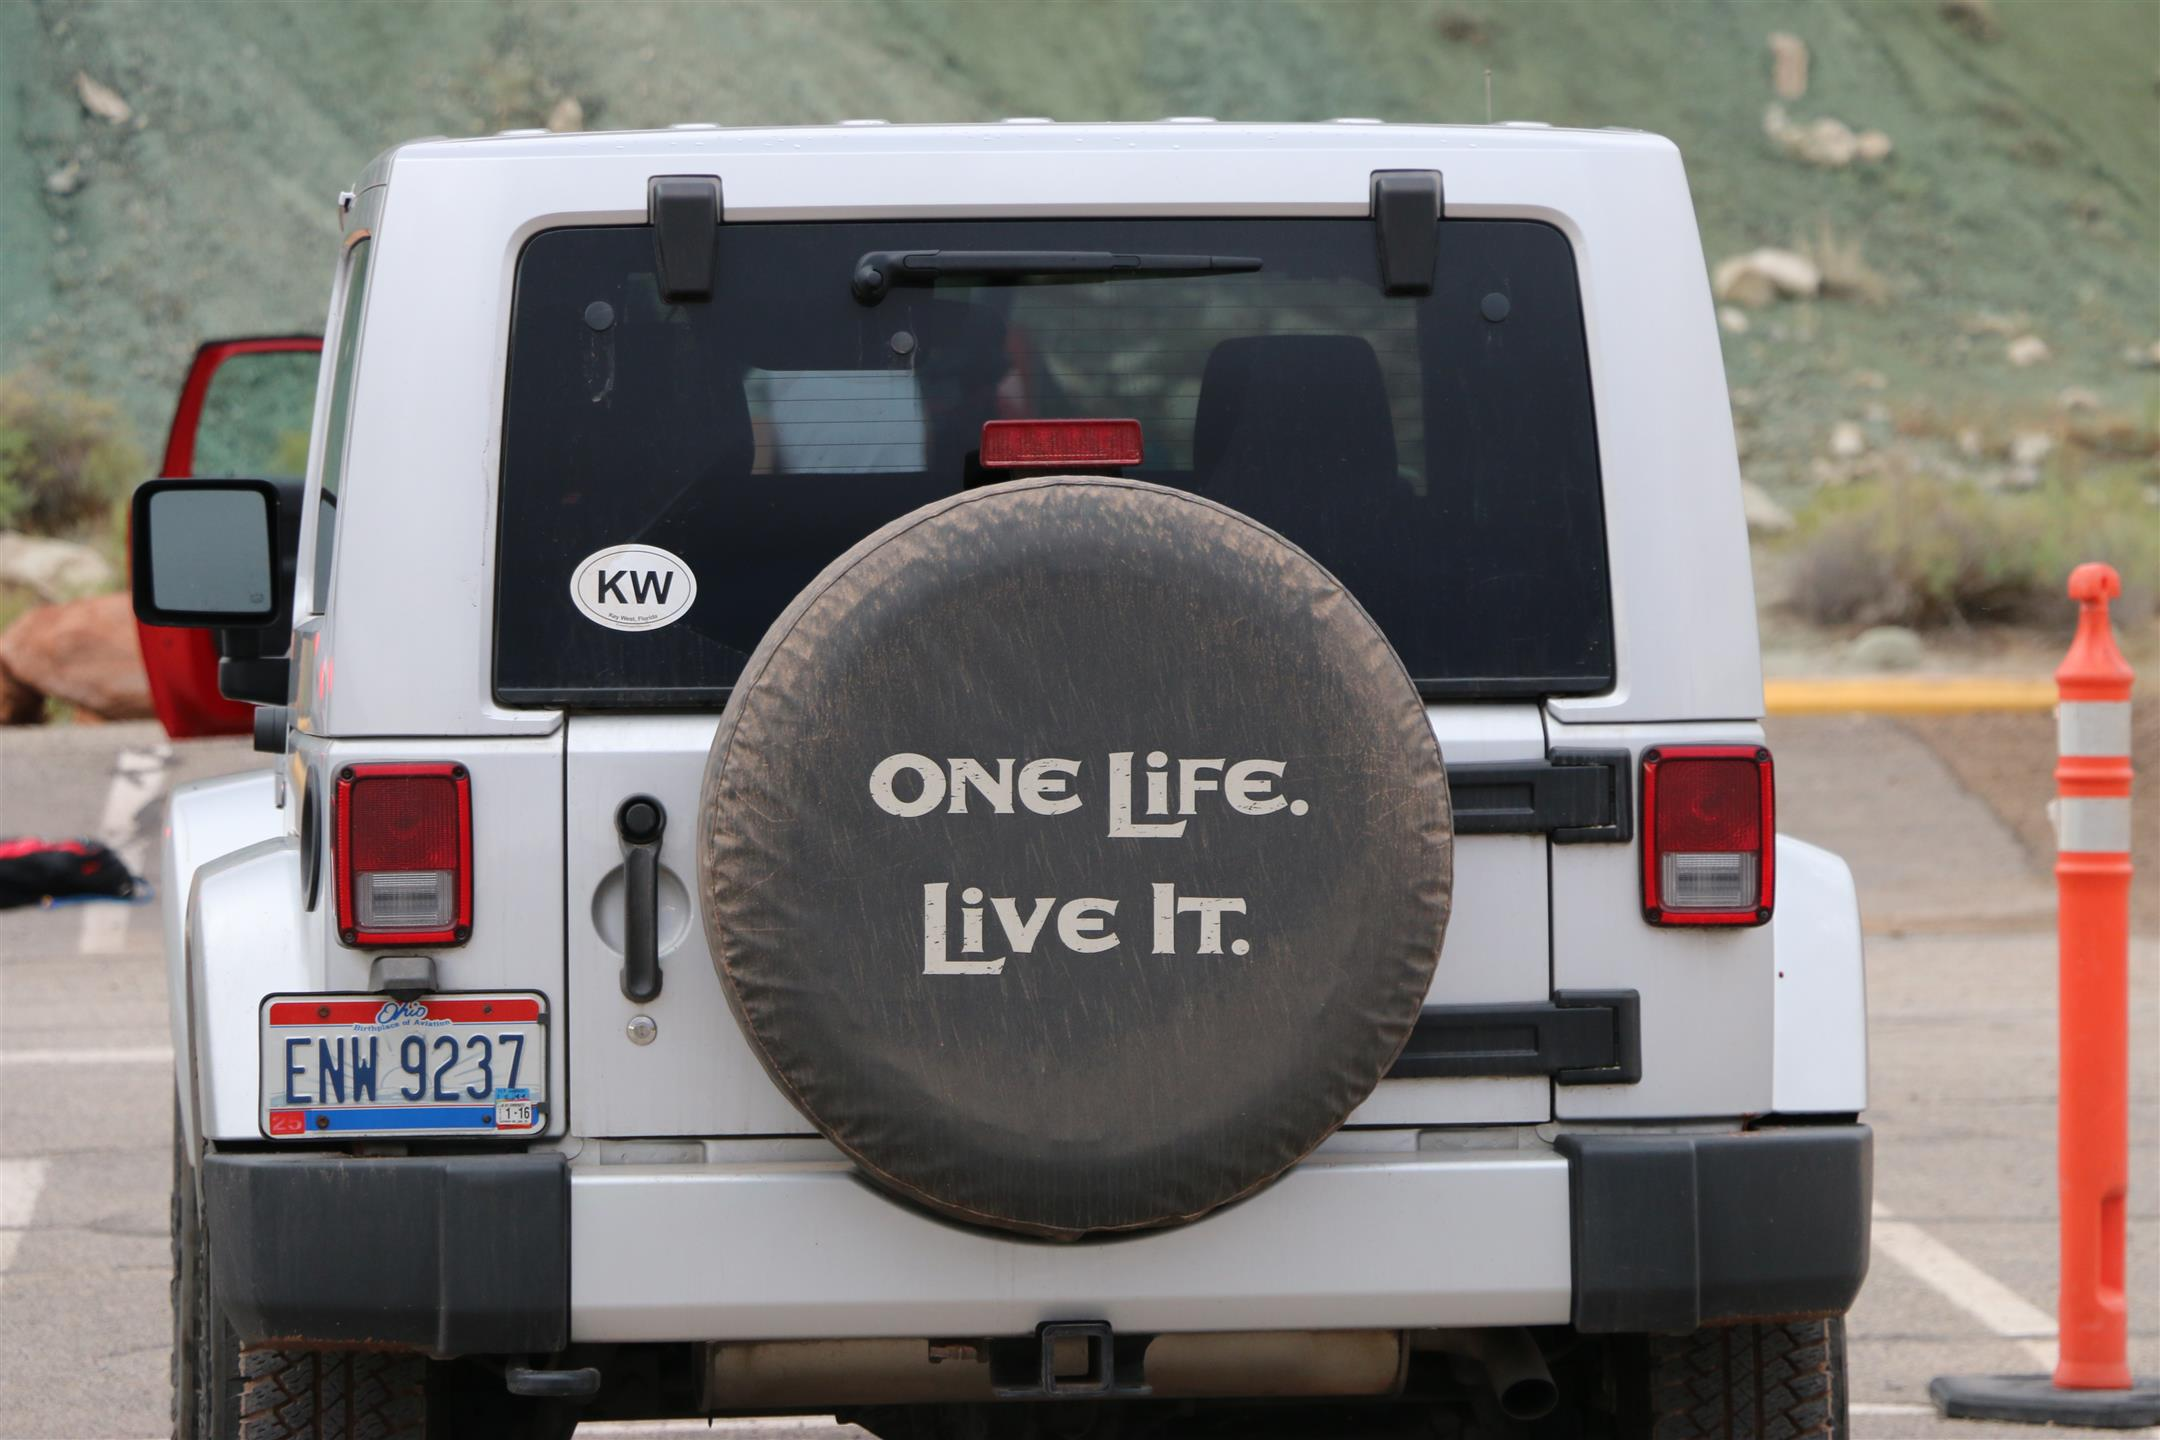 One life...